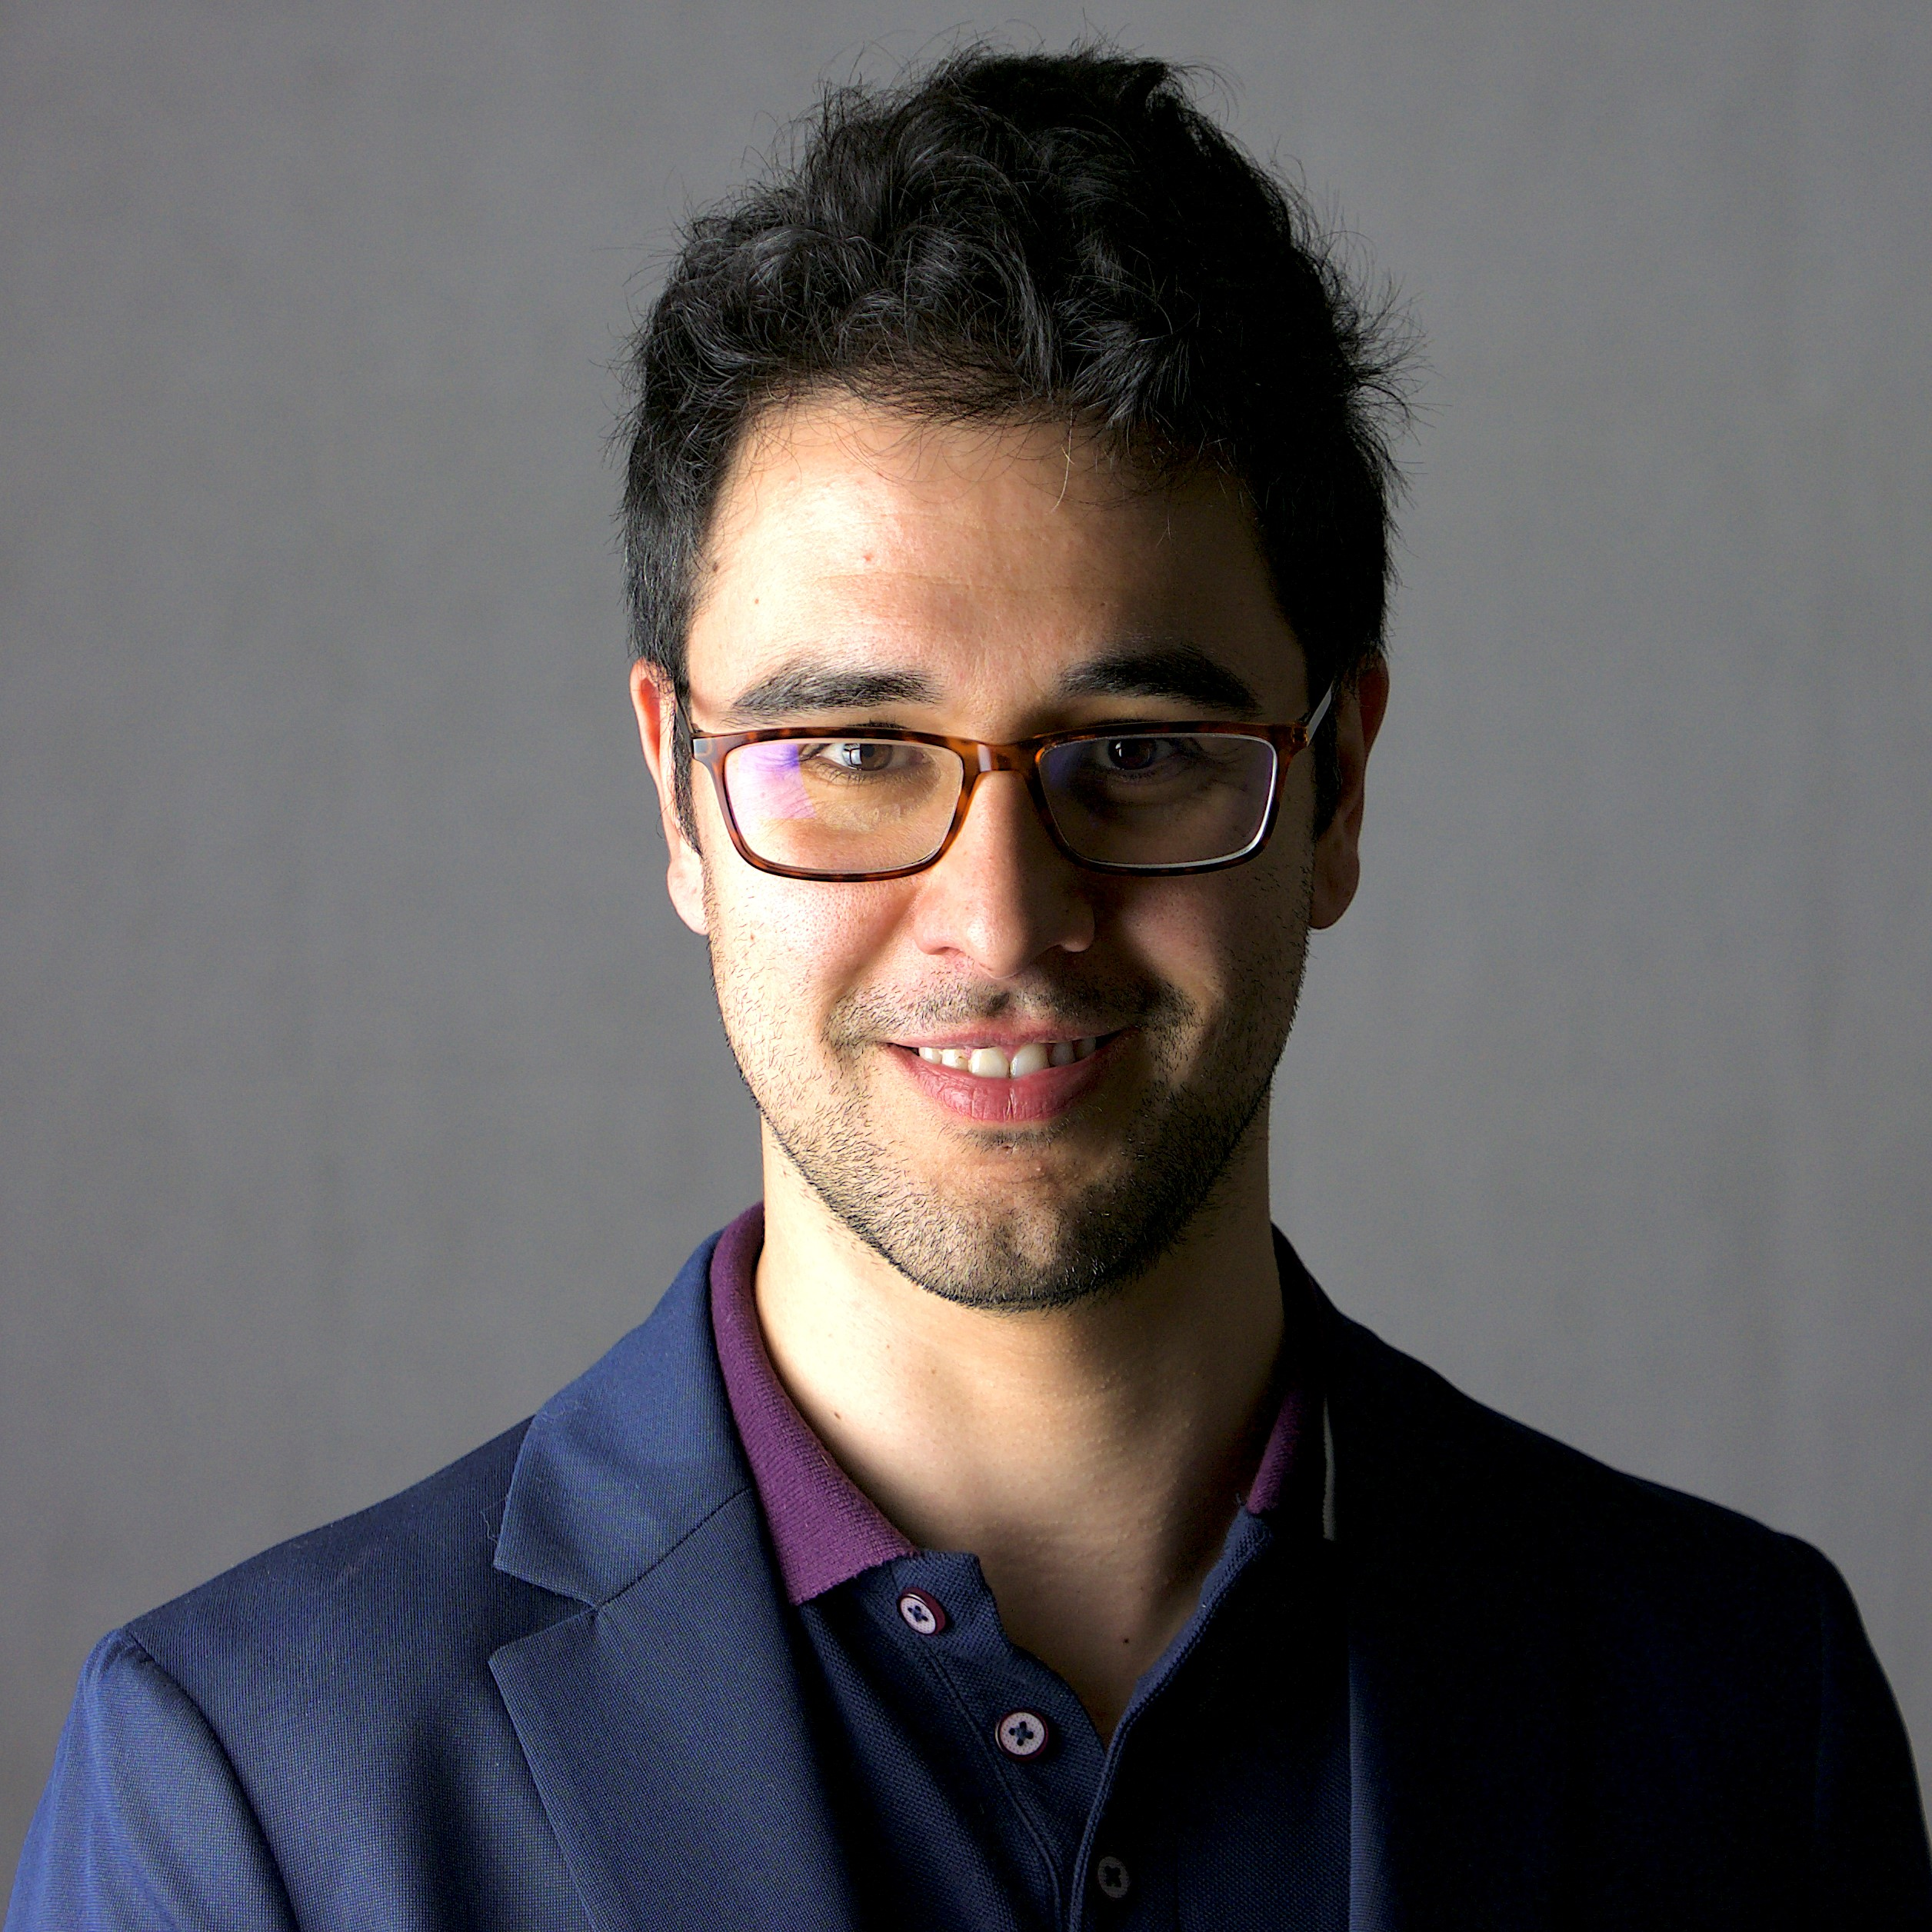 Severino Cirillo